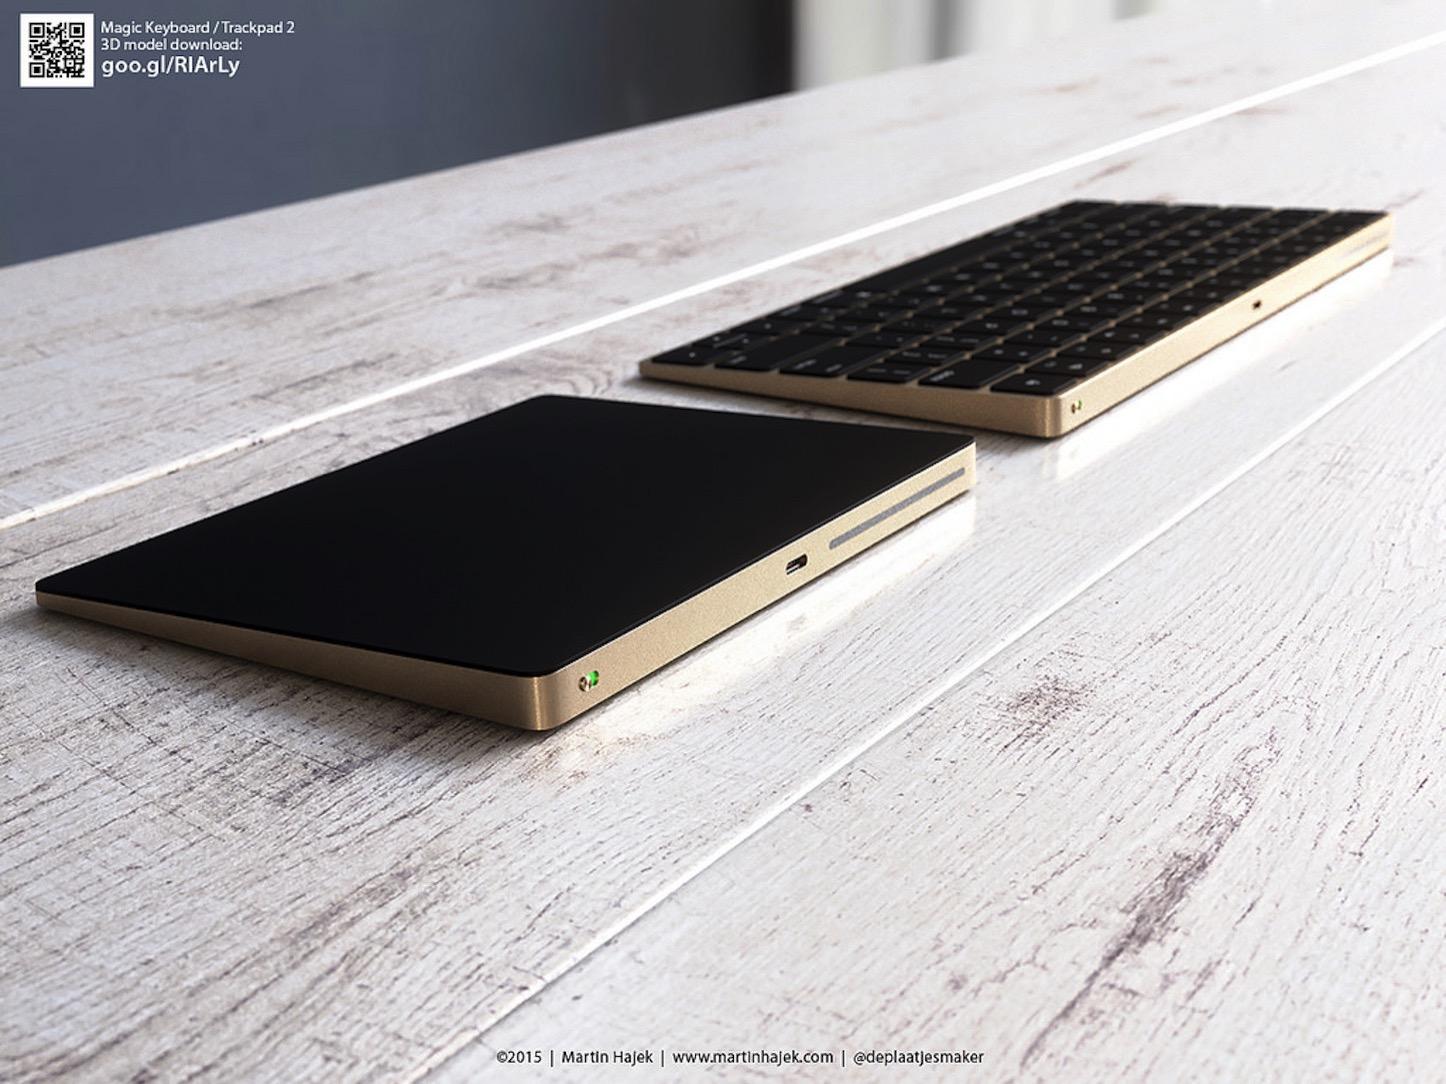 Gold peripherals marting hajek